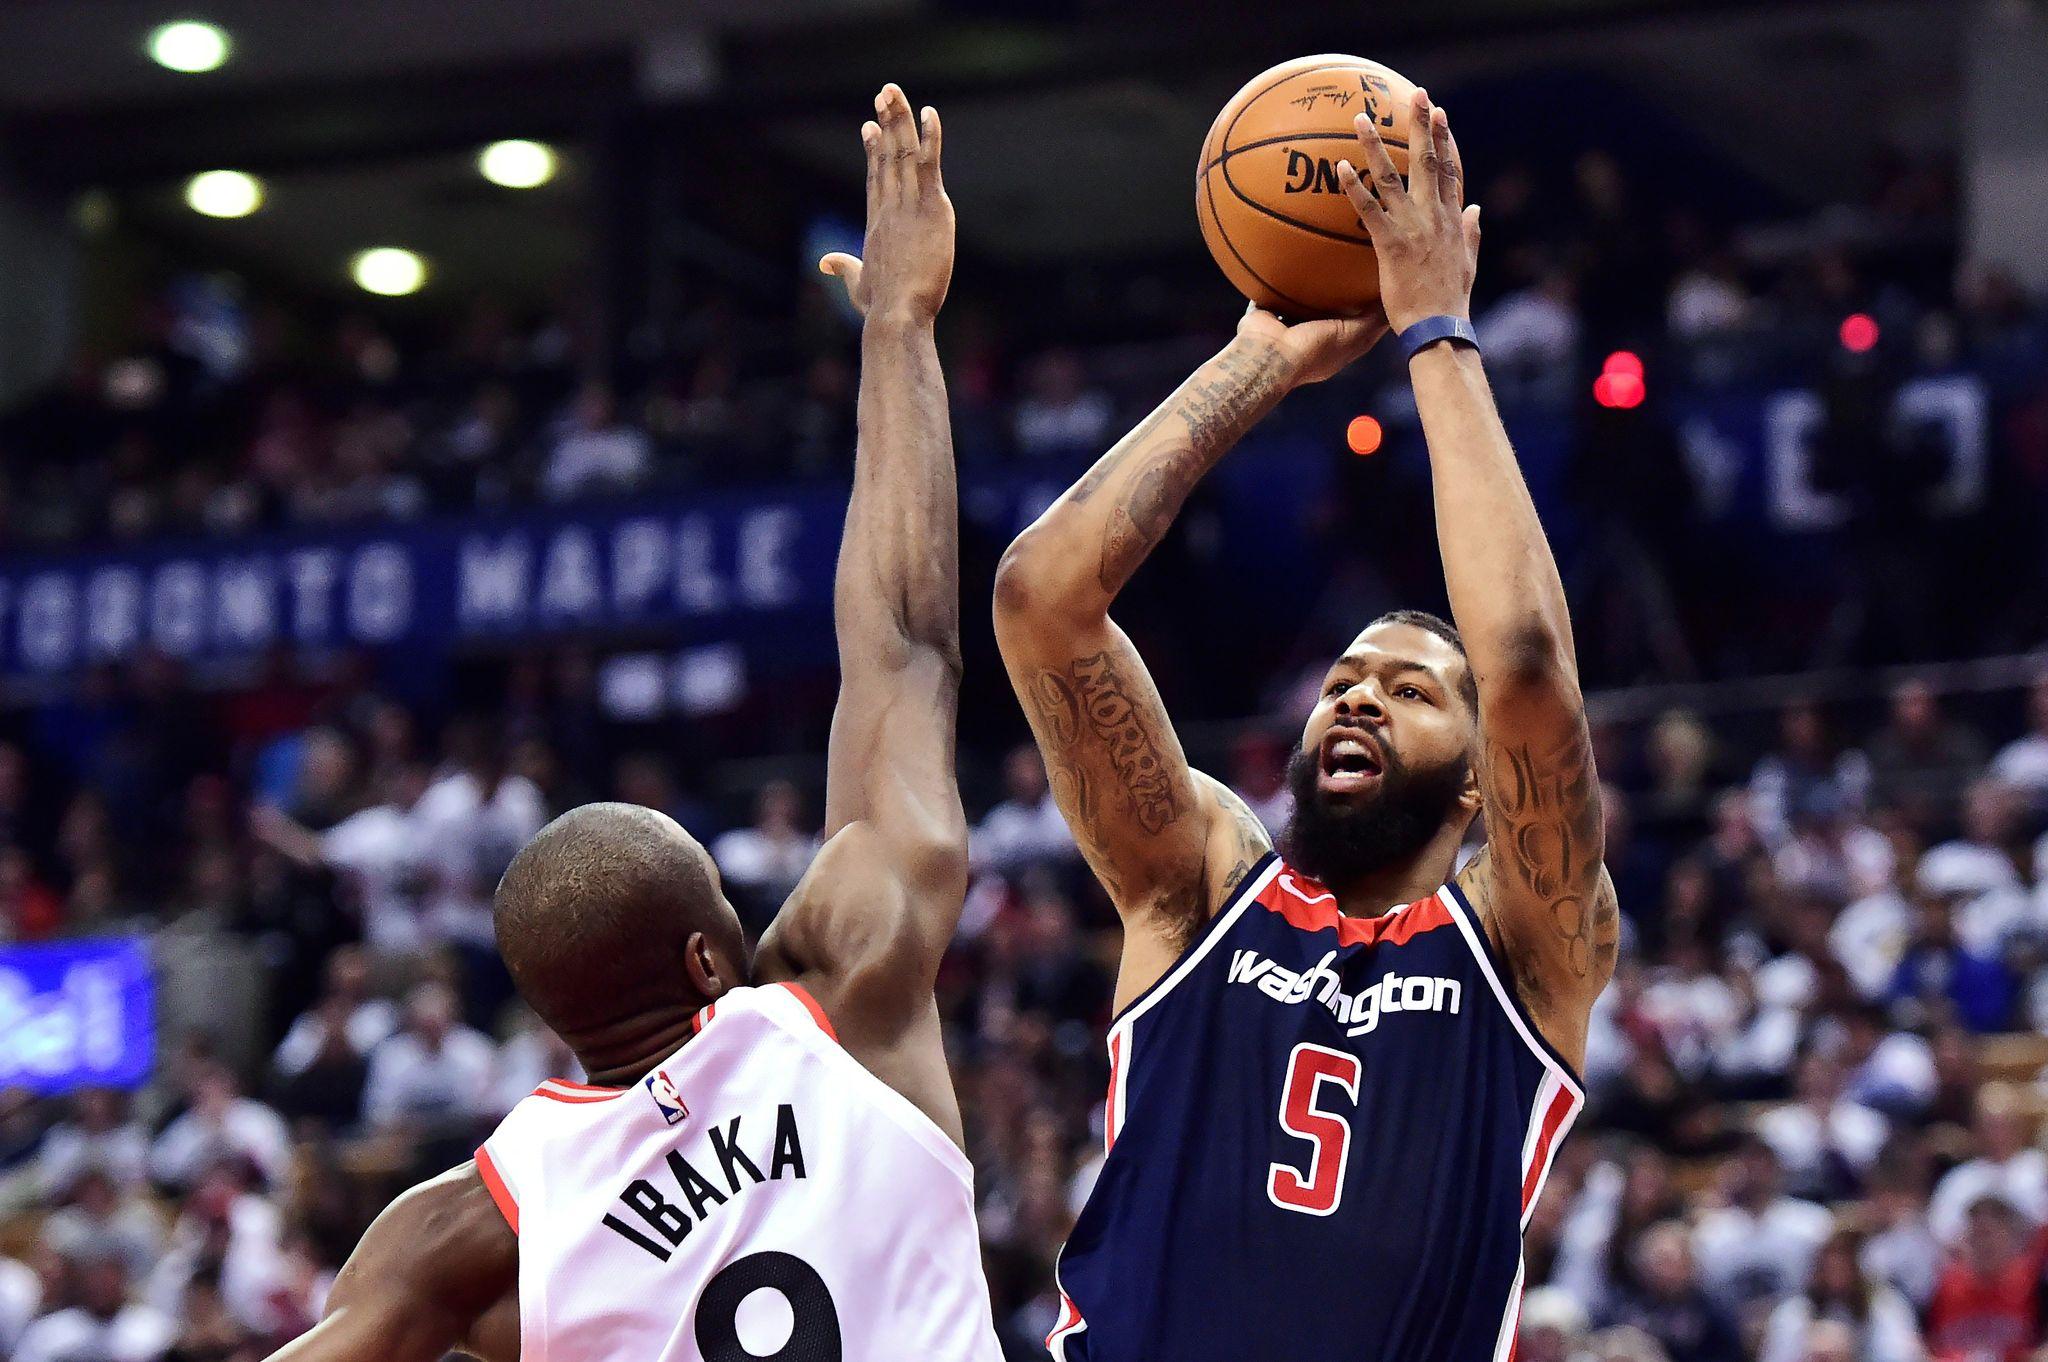 Wizards_raptors_basketball_21499.jpg-1e808_s2048x1362